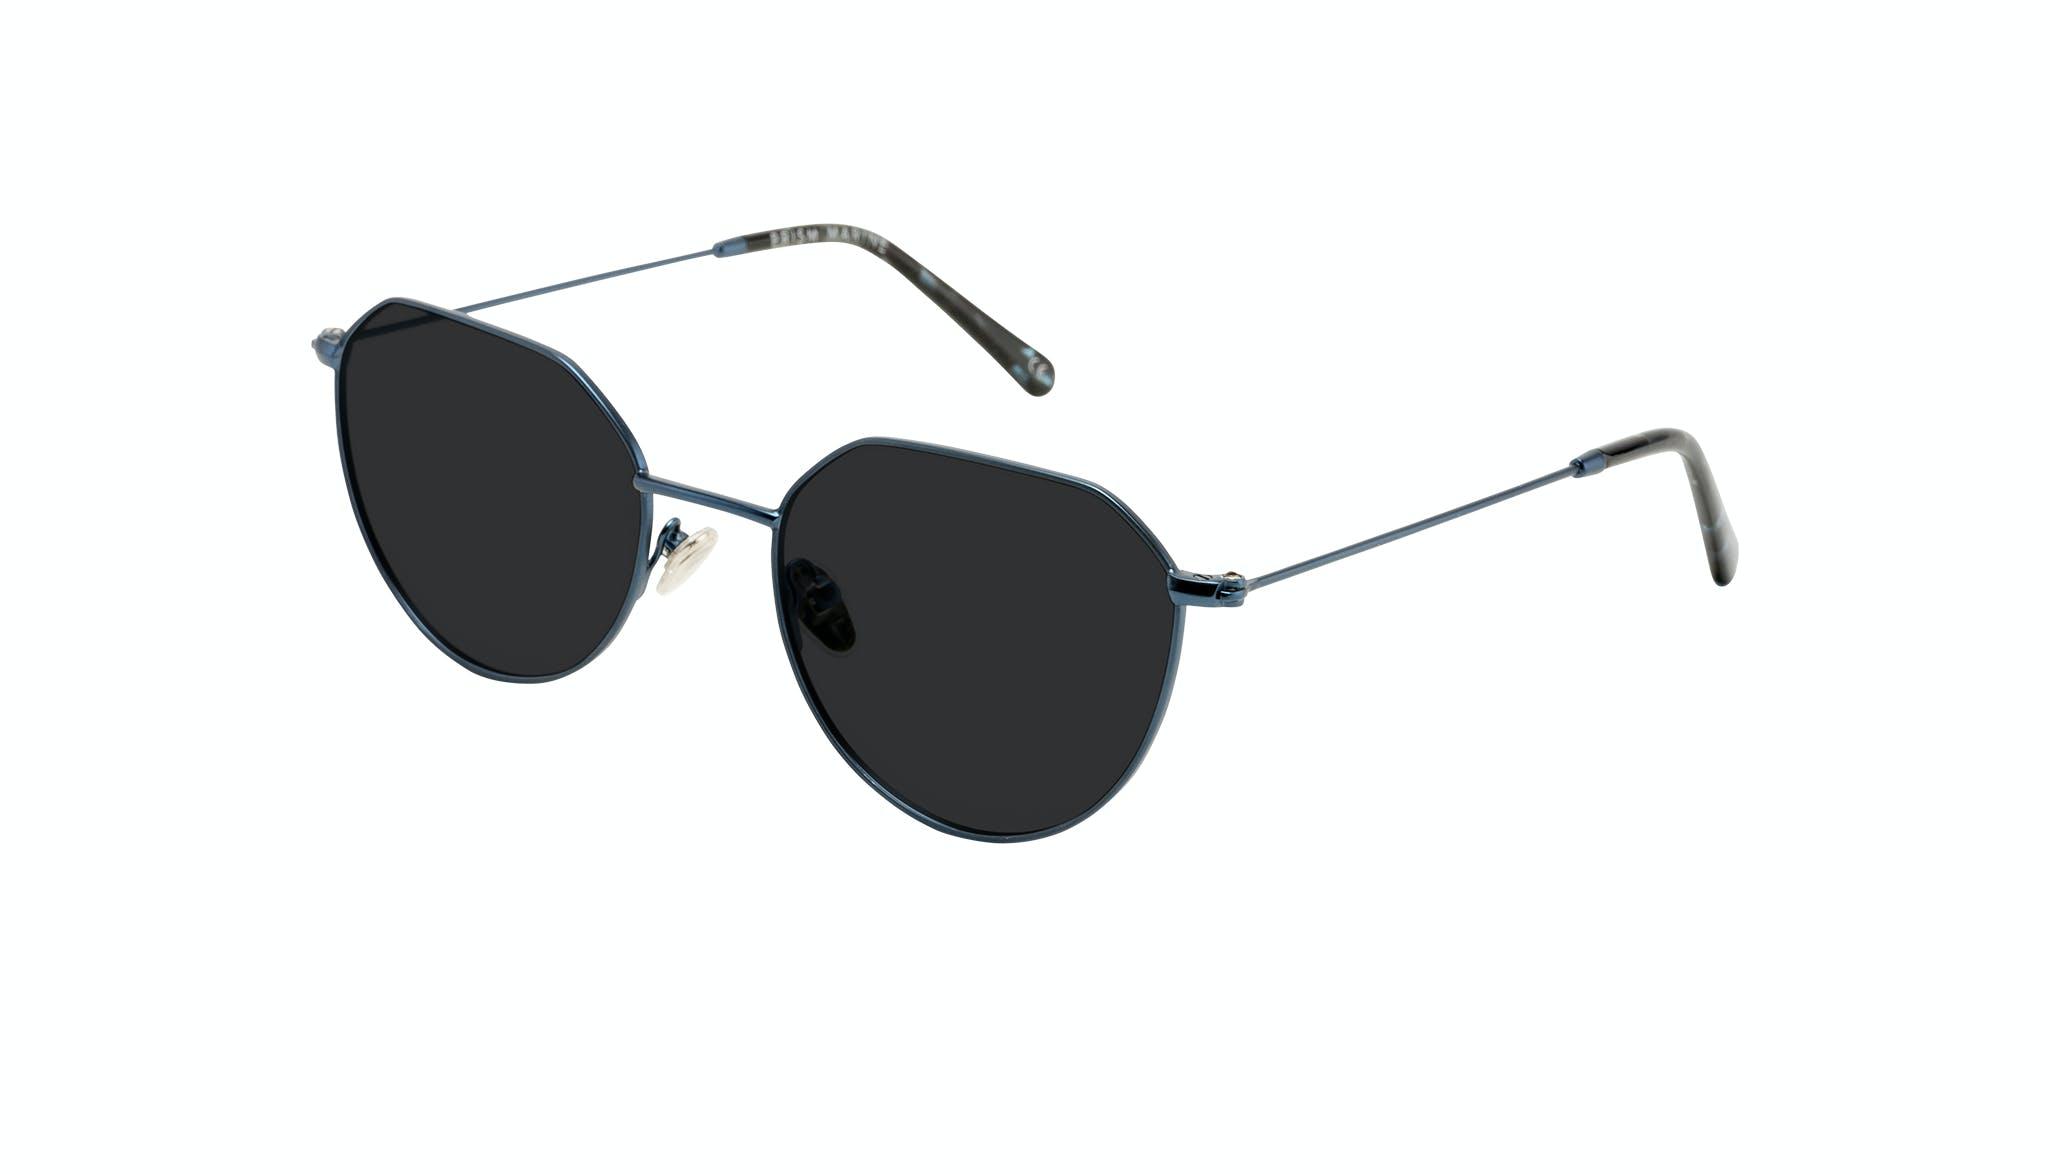 Affordable Fashion Glasses Round Sunglasses Women Prism Marine Tilt